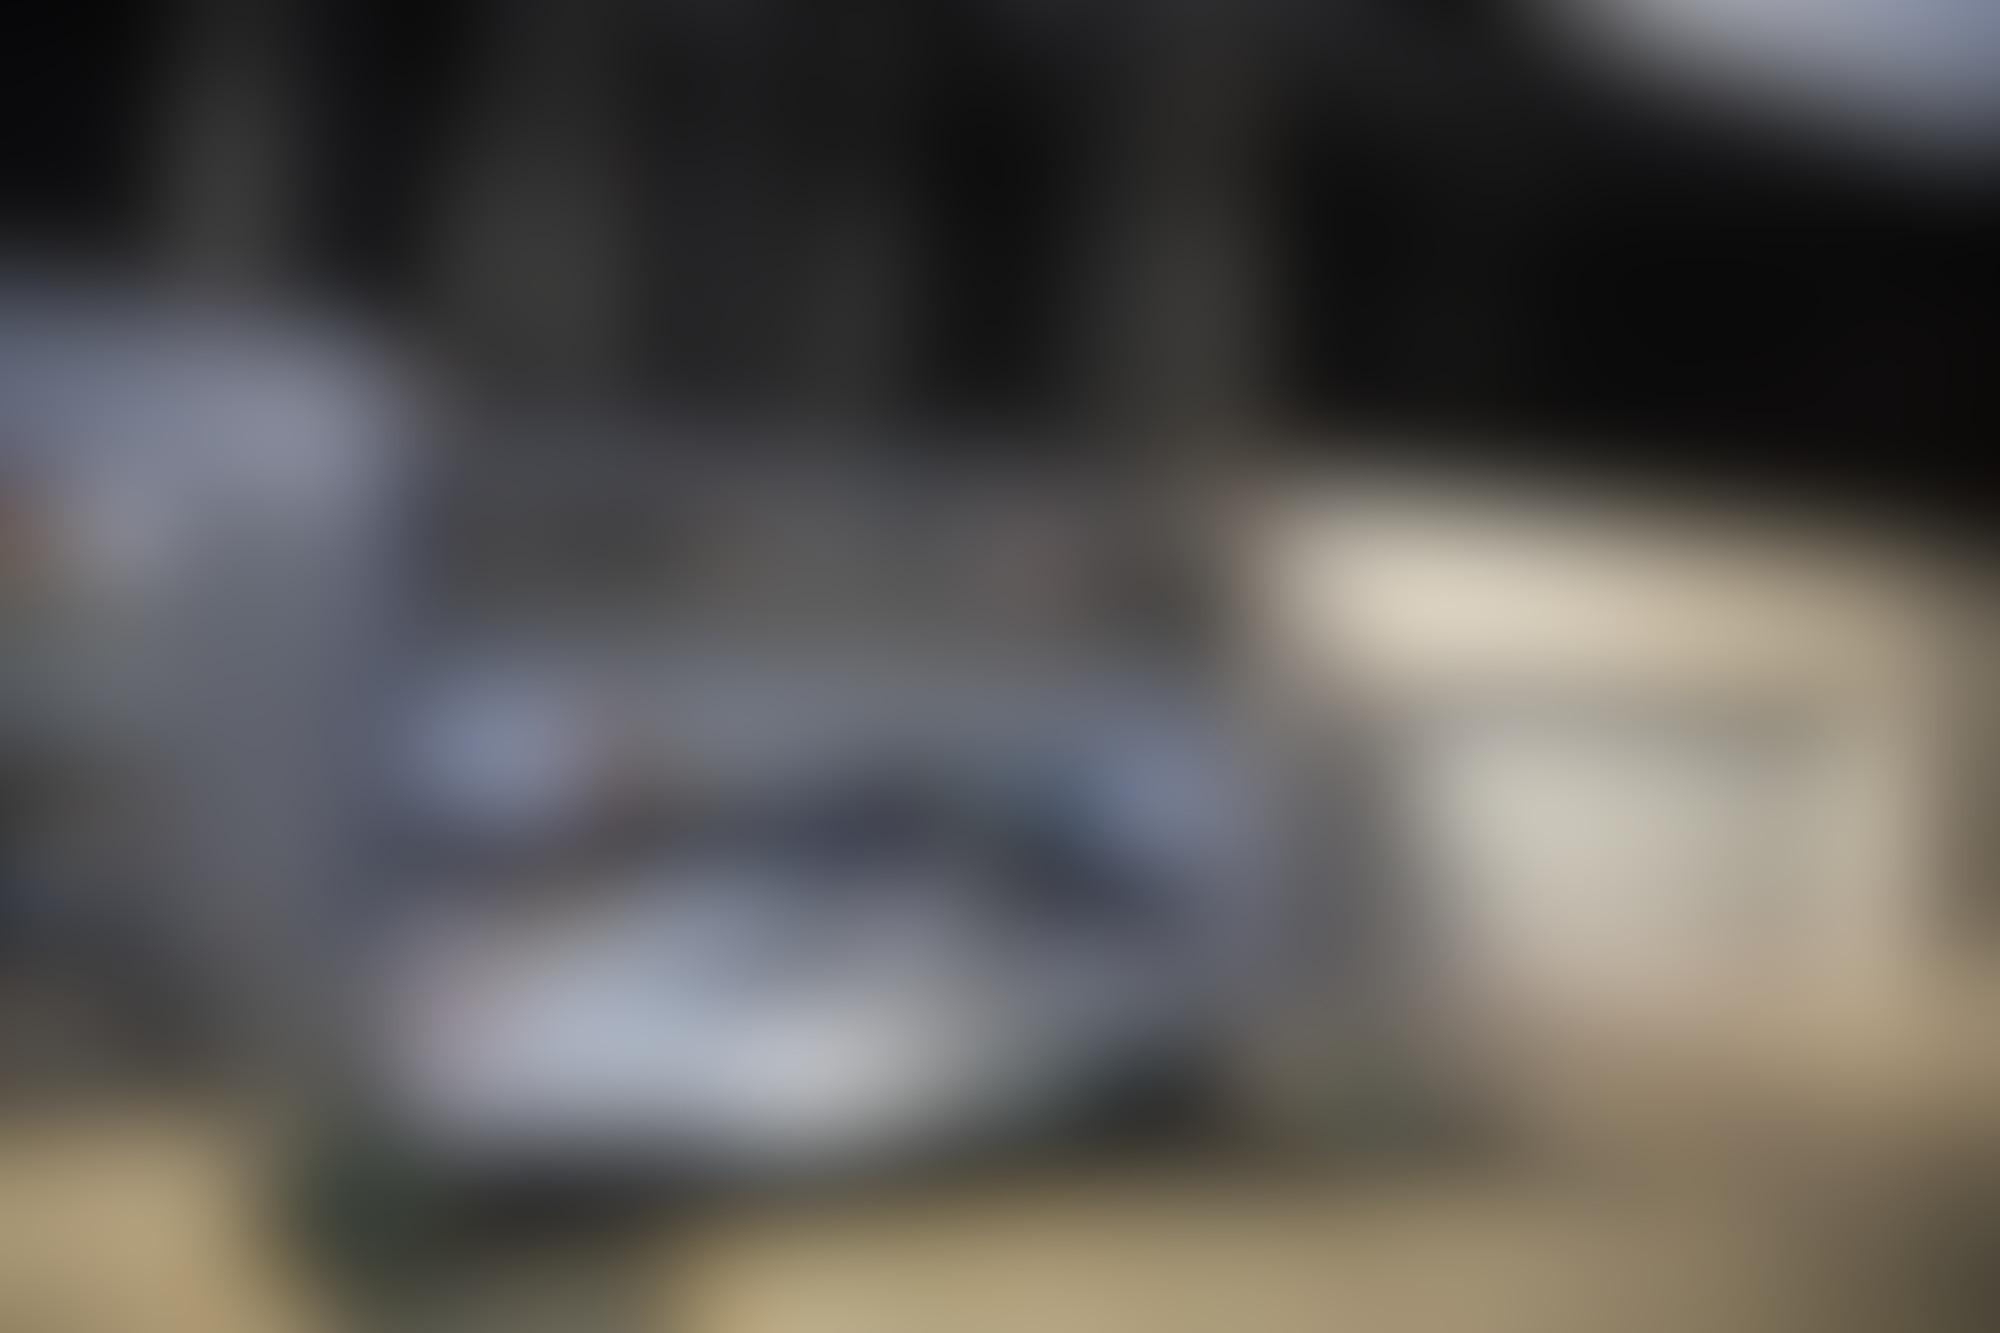 F1 Promo 2019 9249 28 01 19 JD autocompressfitresizeixlibphp 1 1 0max h2000max w3 D2000q80s542993d63462637a6e424ac687ebff76